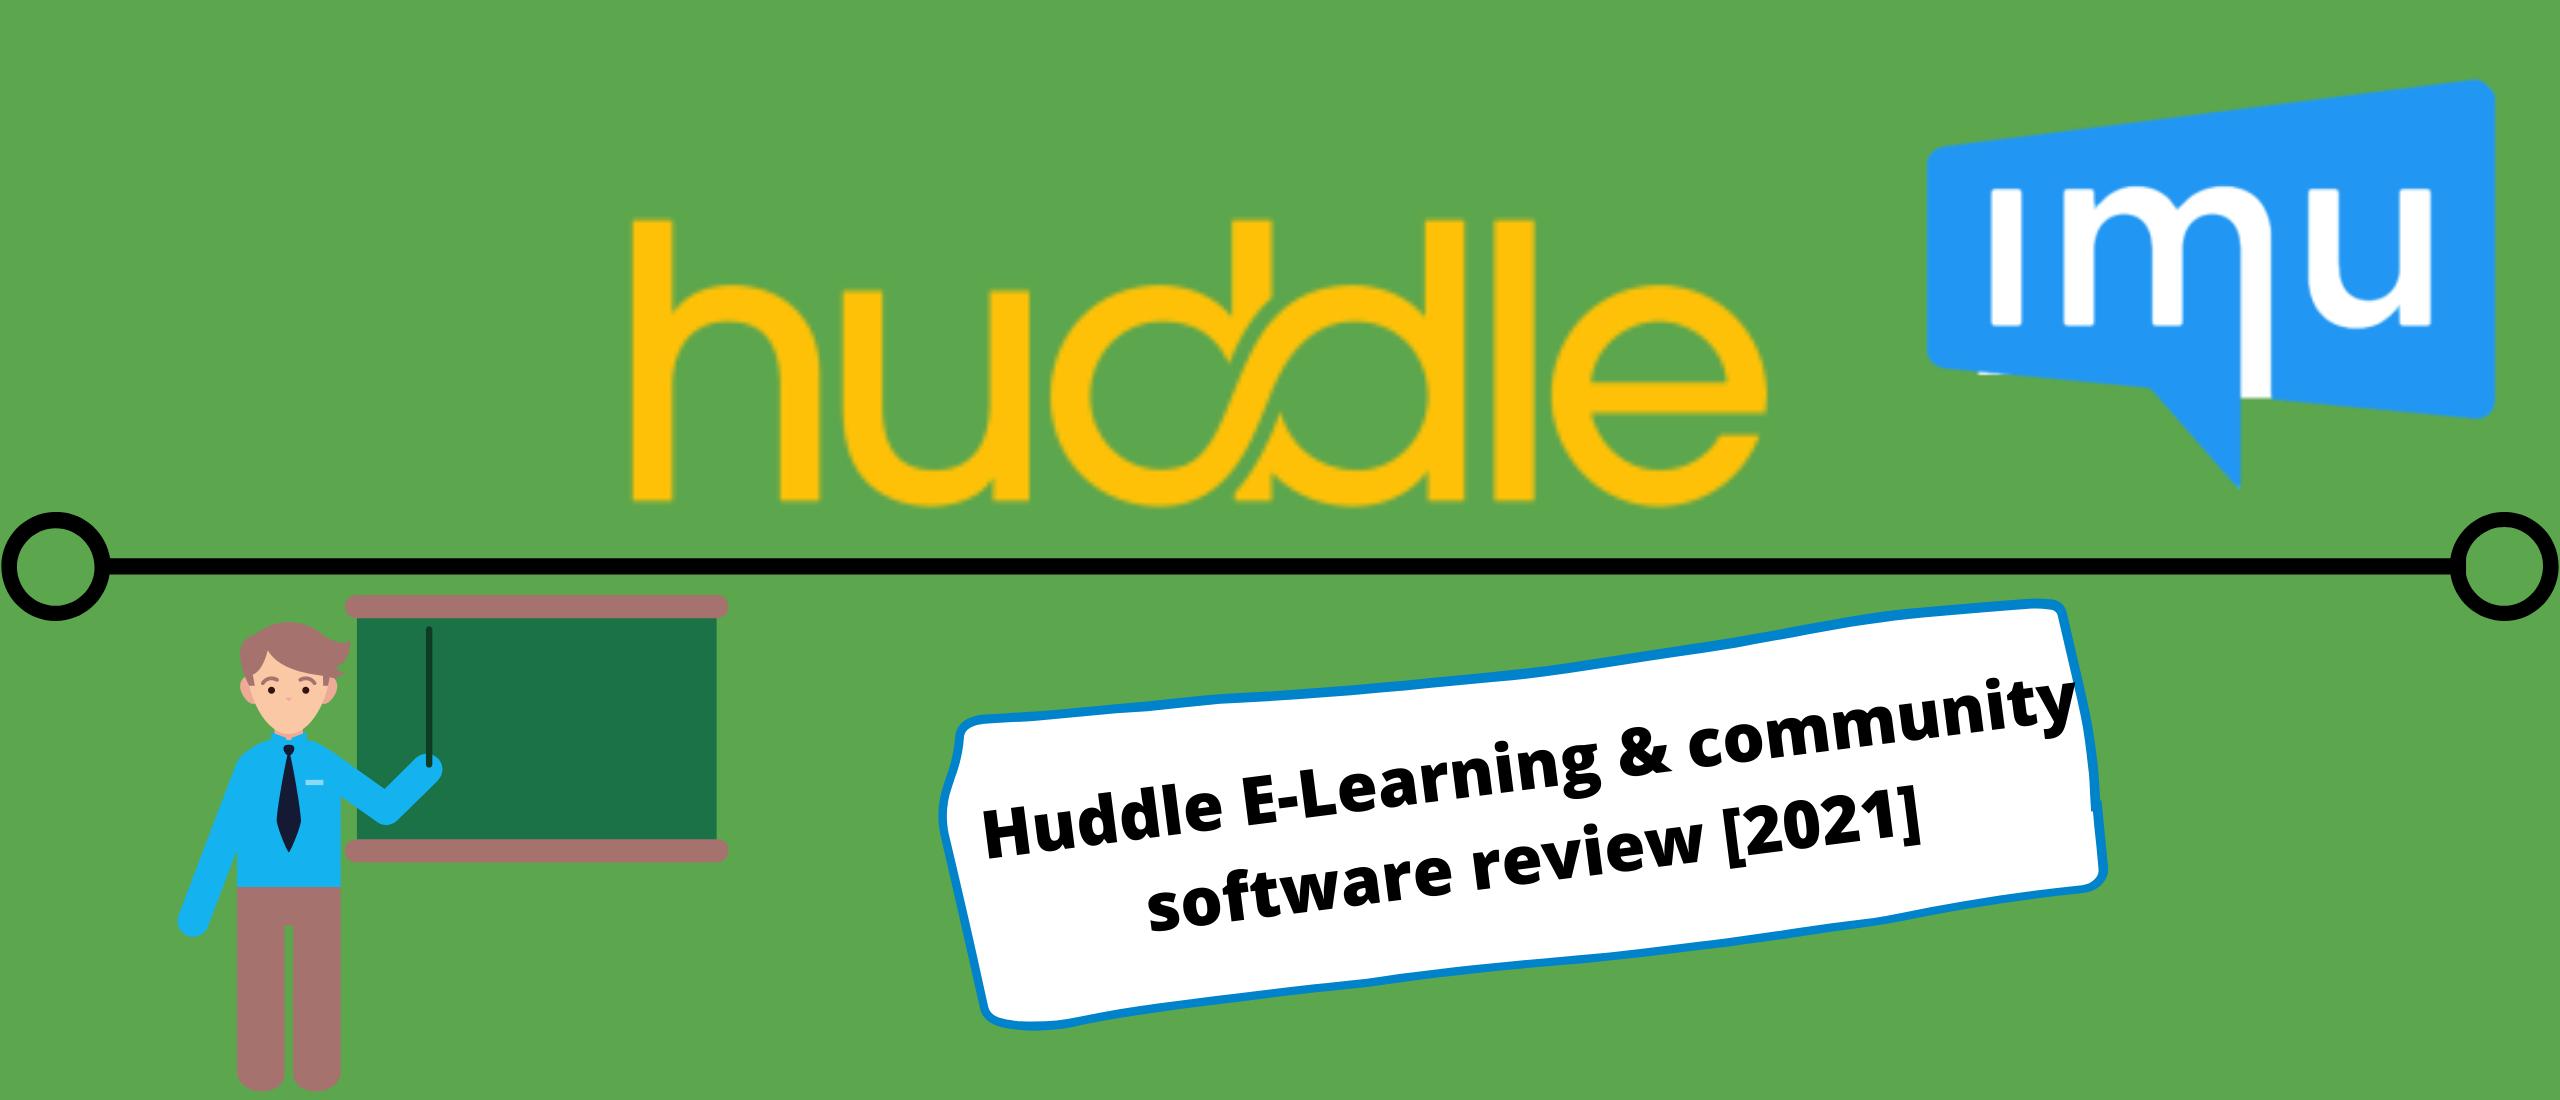 Huddle E-Learning & community software review [2021] 14 Dagen gratis